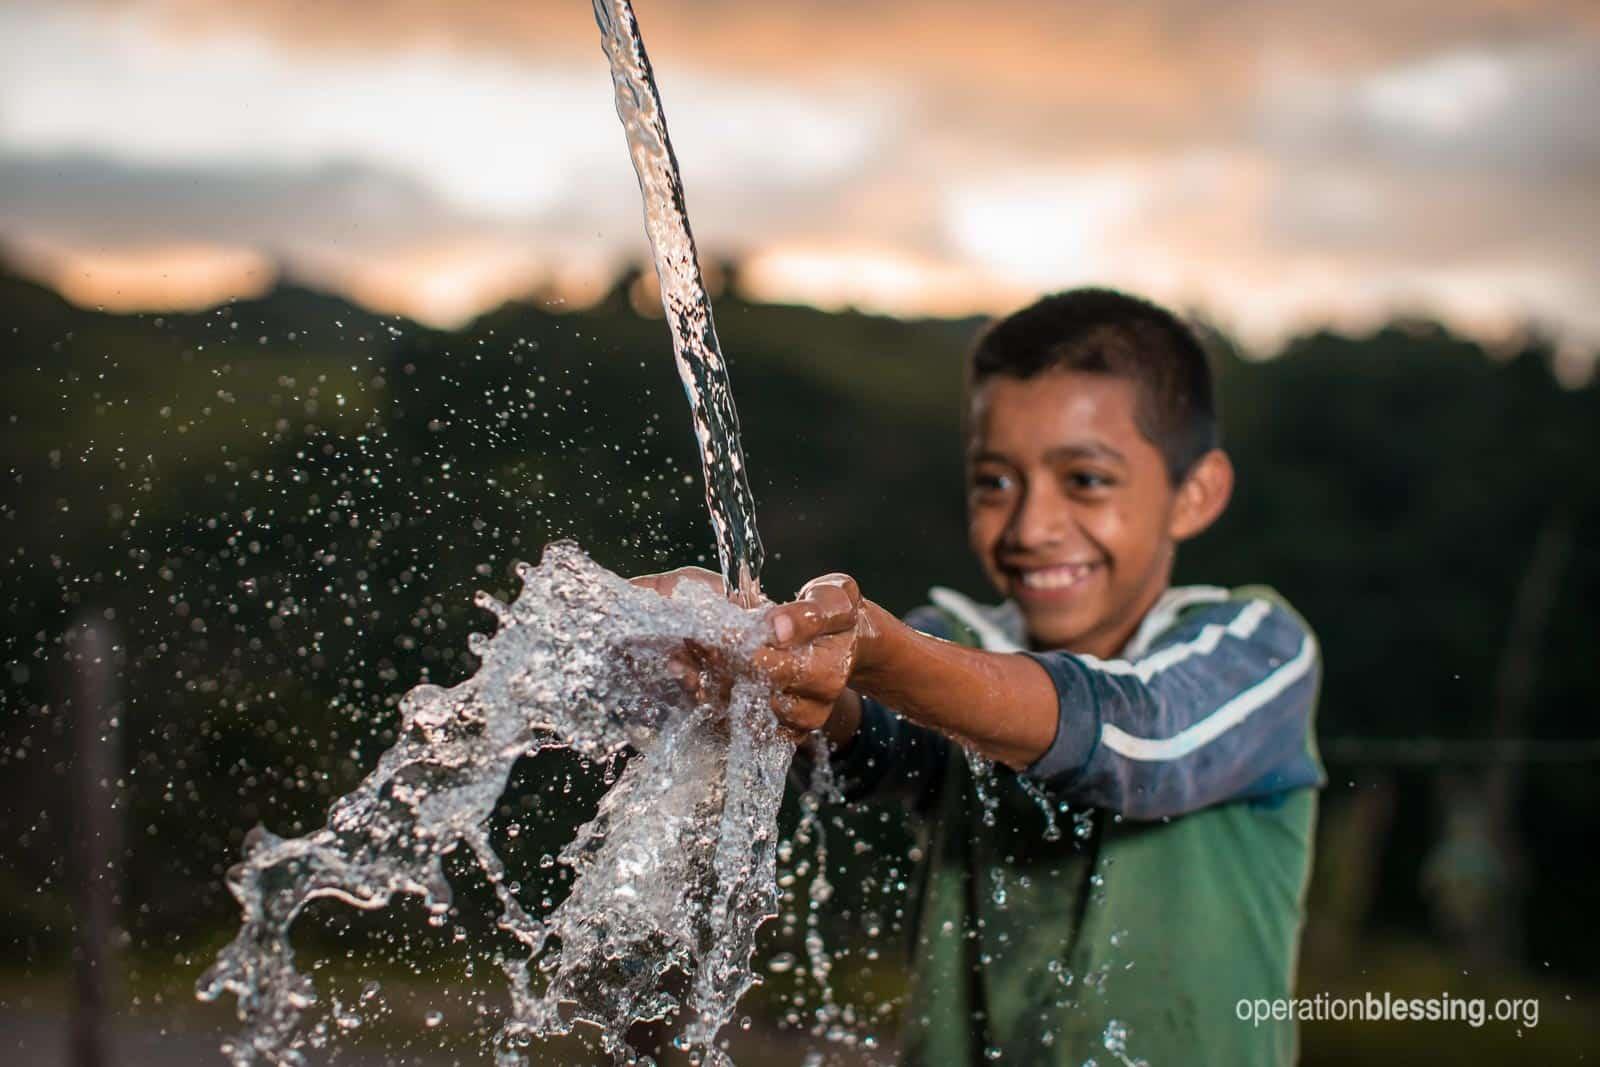 A boy splashing in fresh, clean water.